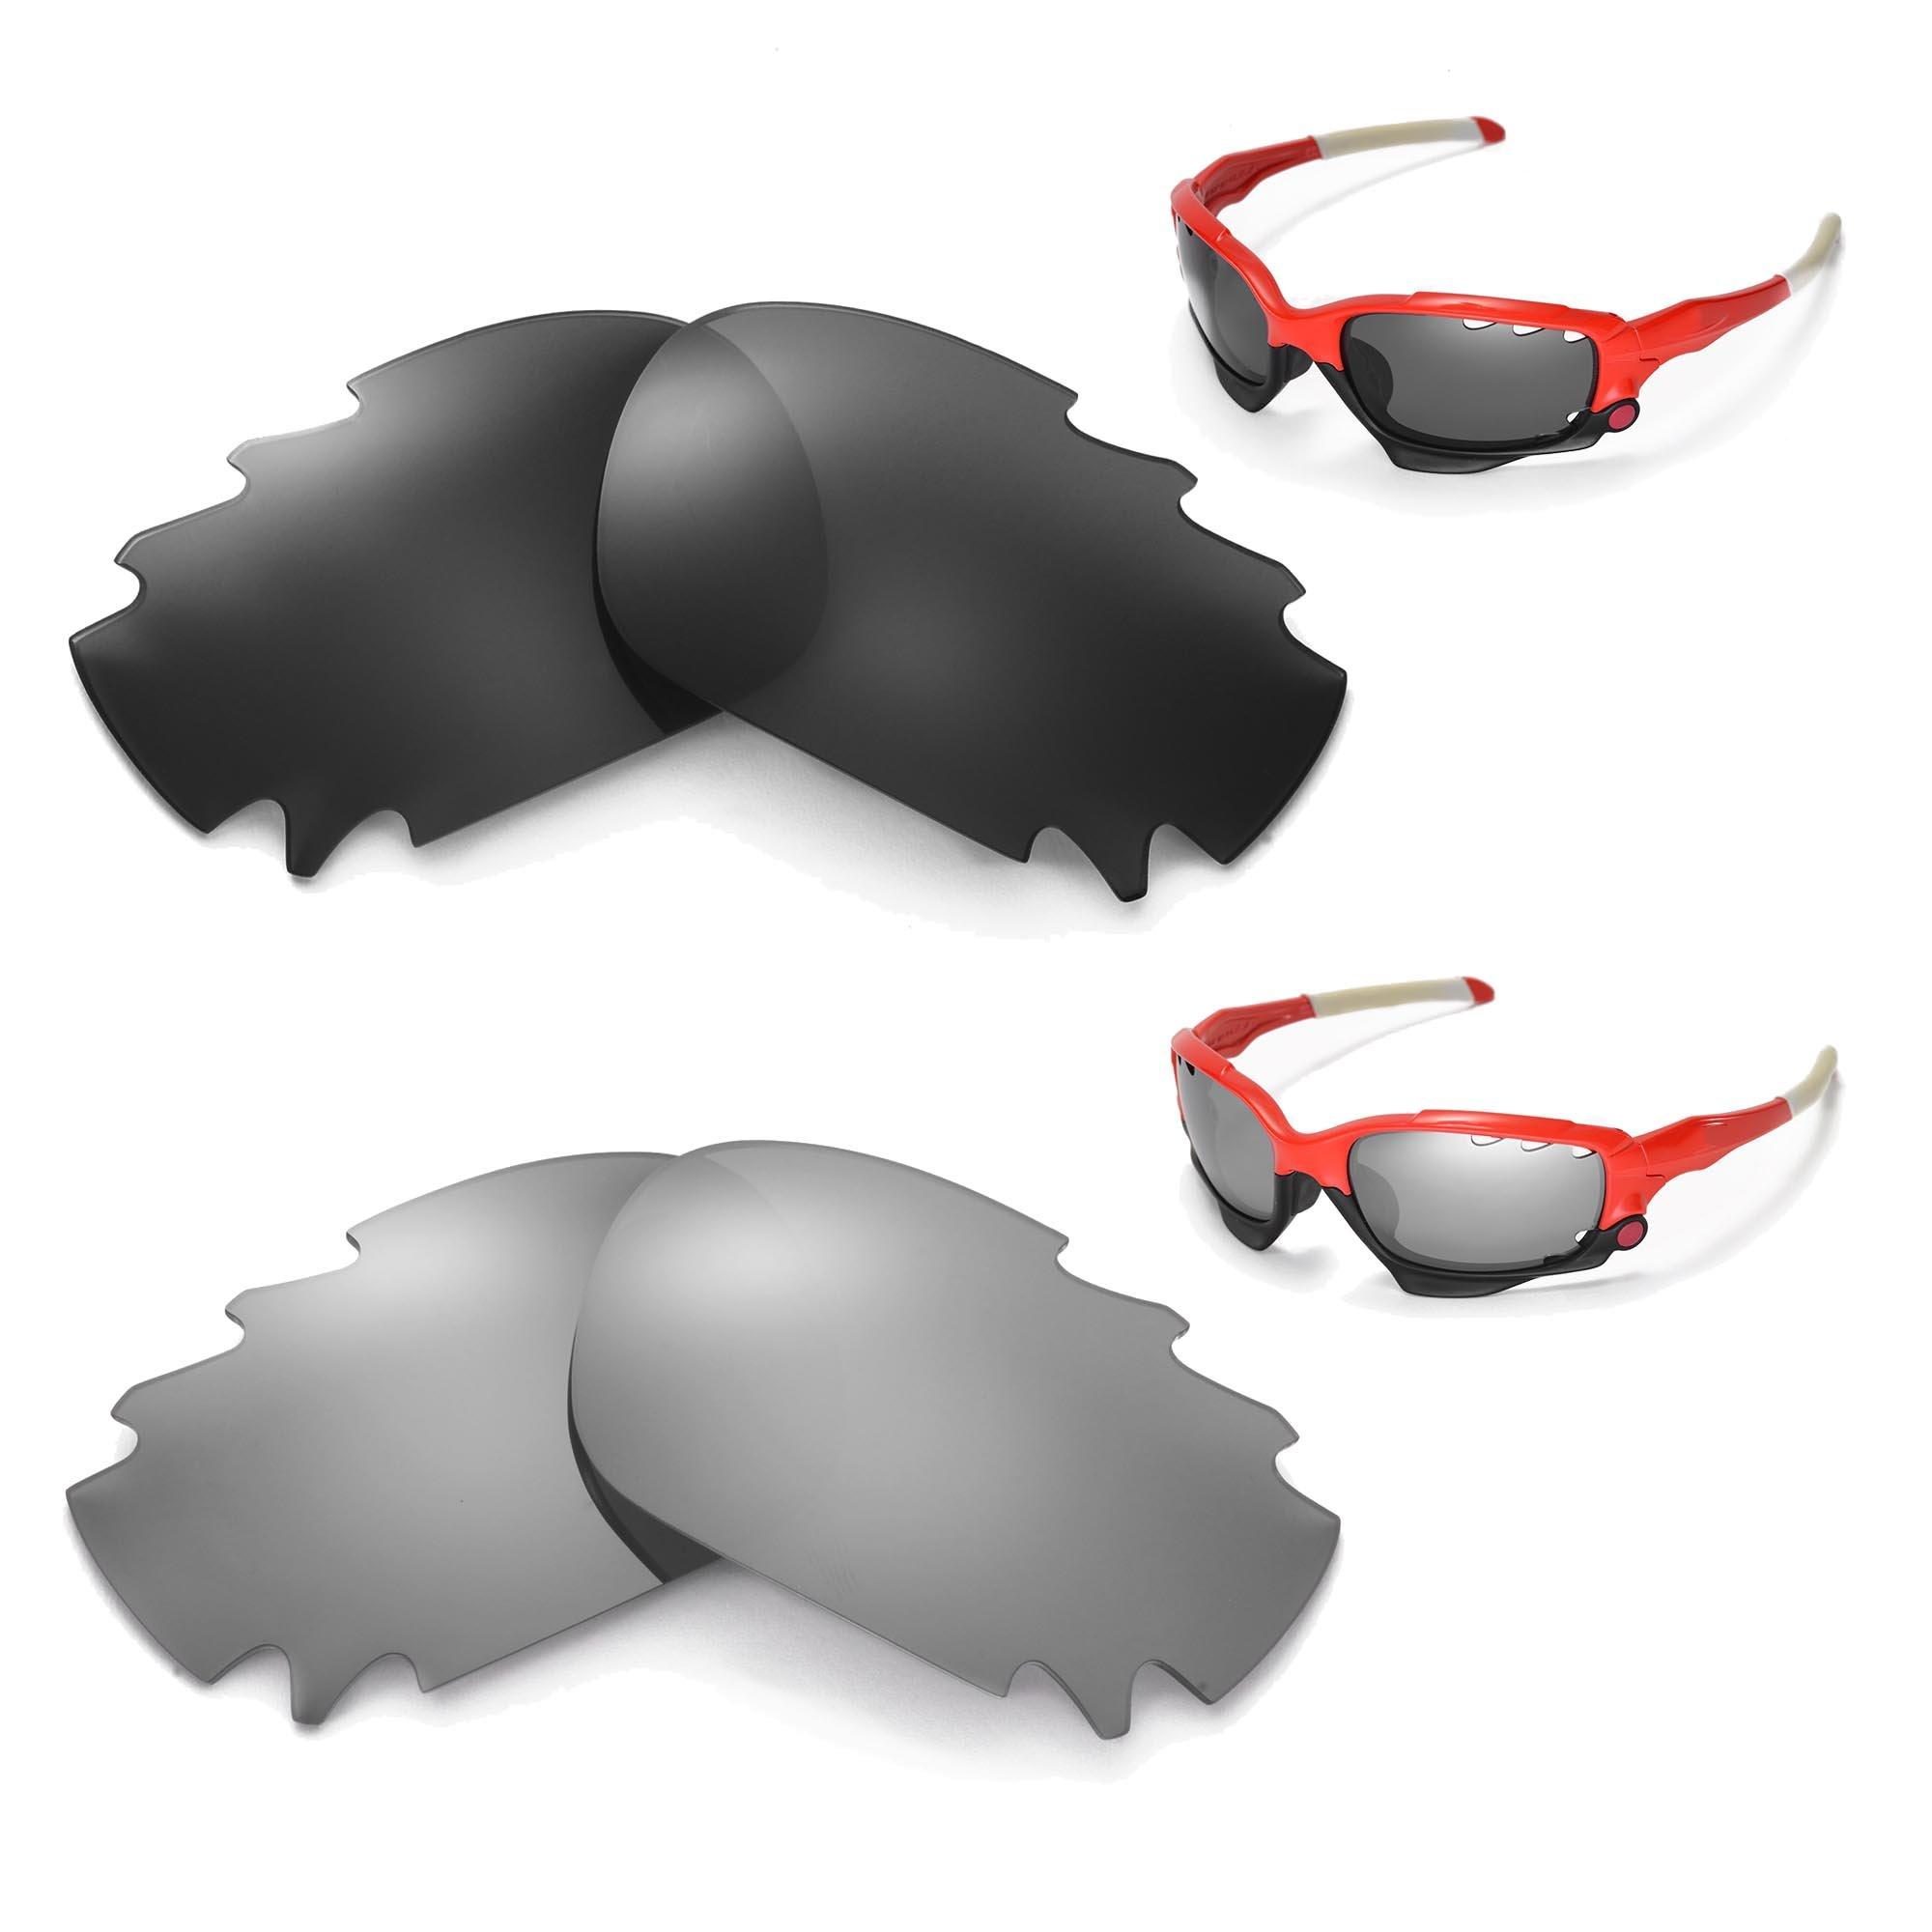 New Walleva Polarized Black + Titanium Vented Lenses for Oakley Racing Jacket